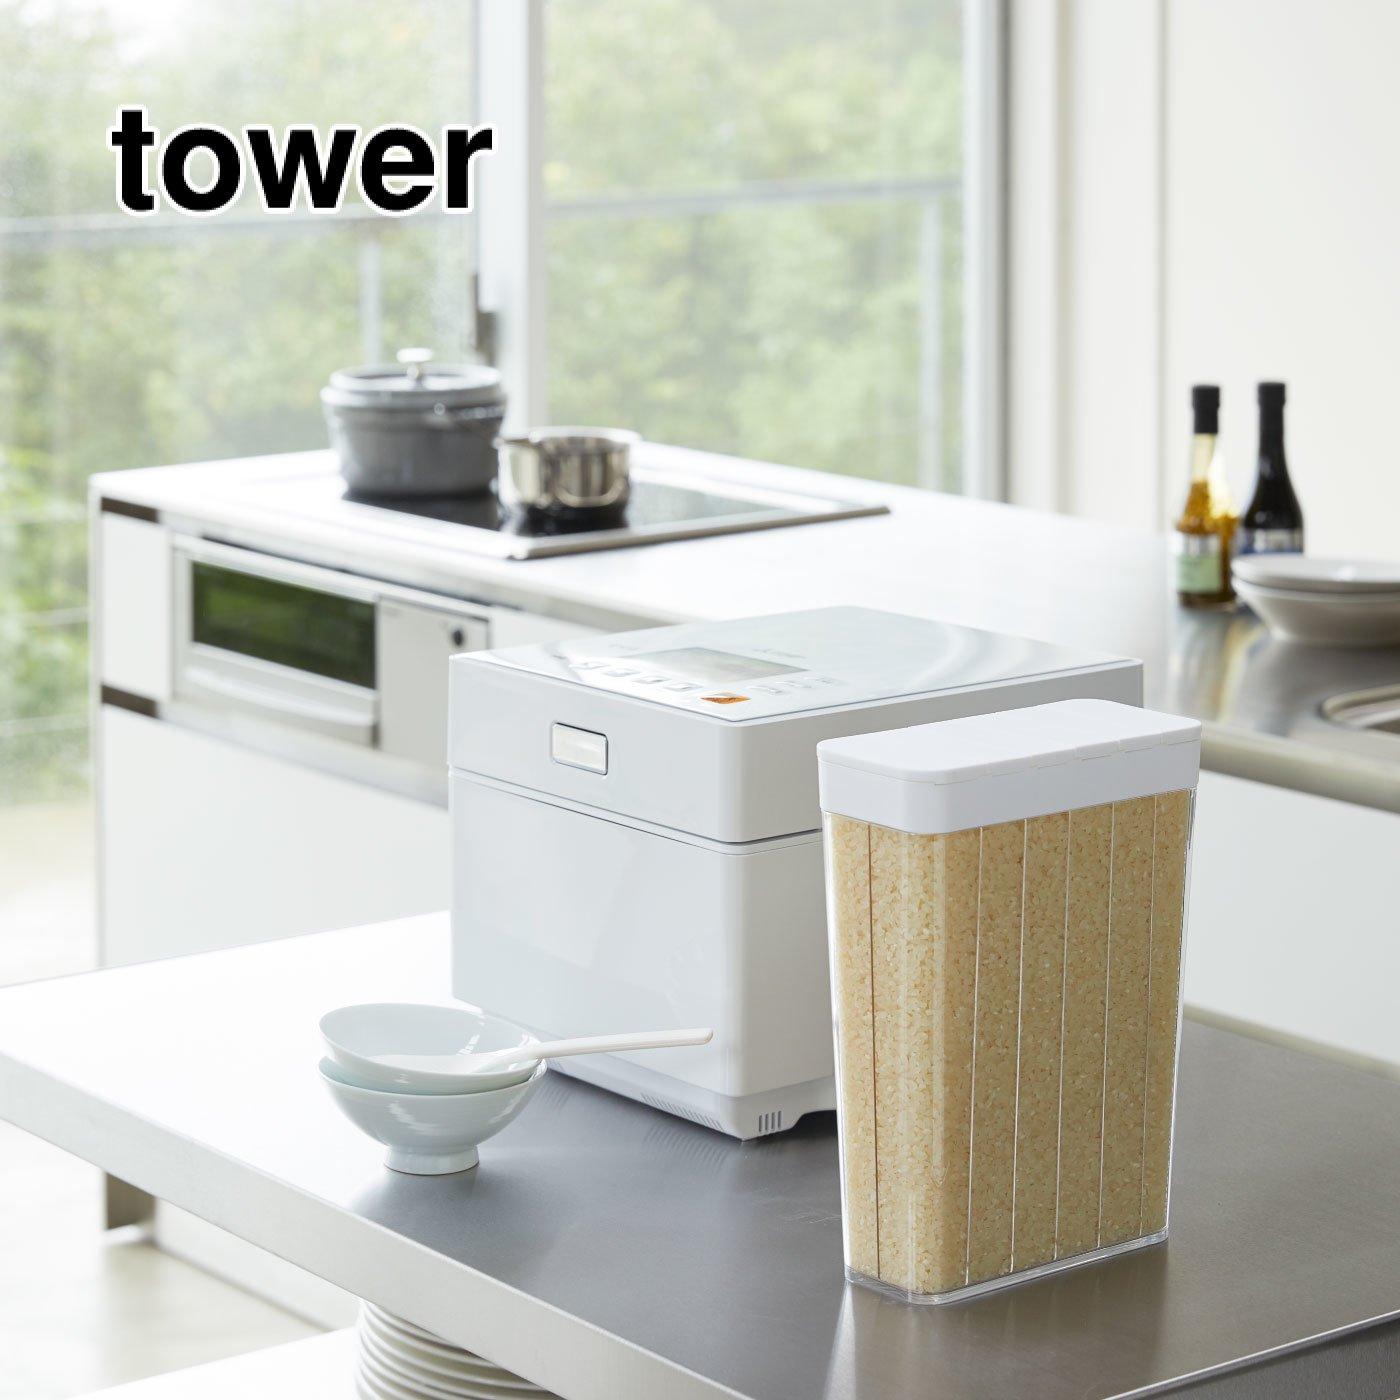 tower 1合分別 冷蔵庫用米びつ